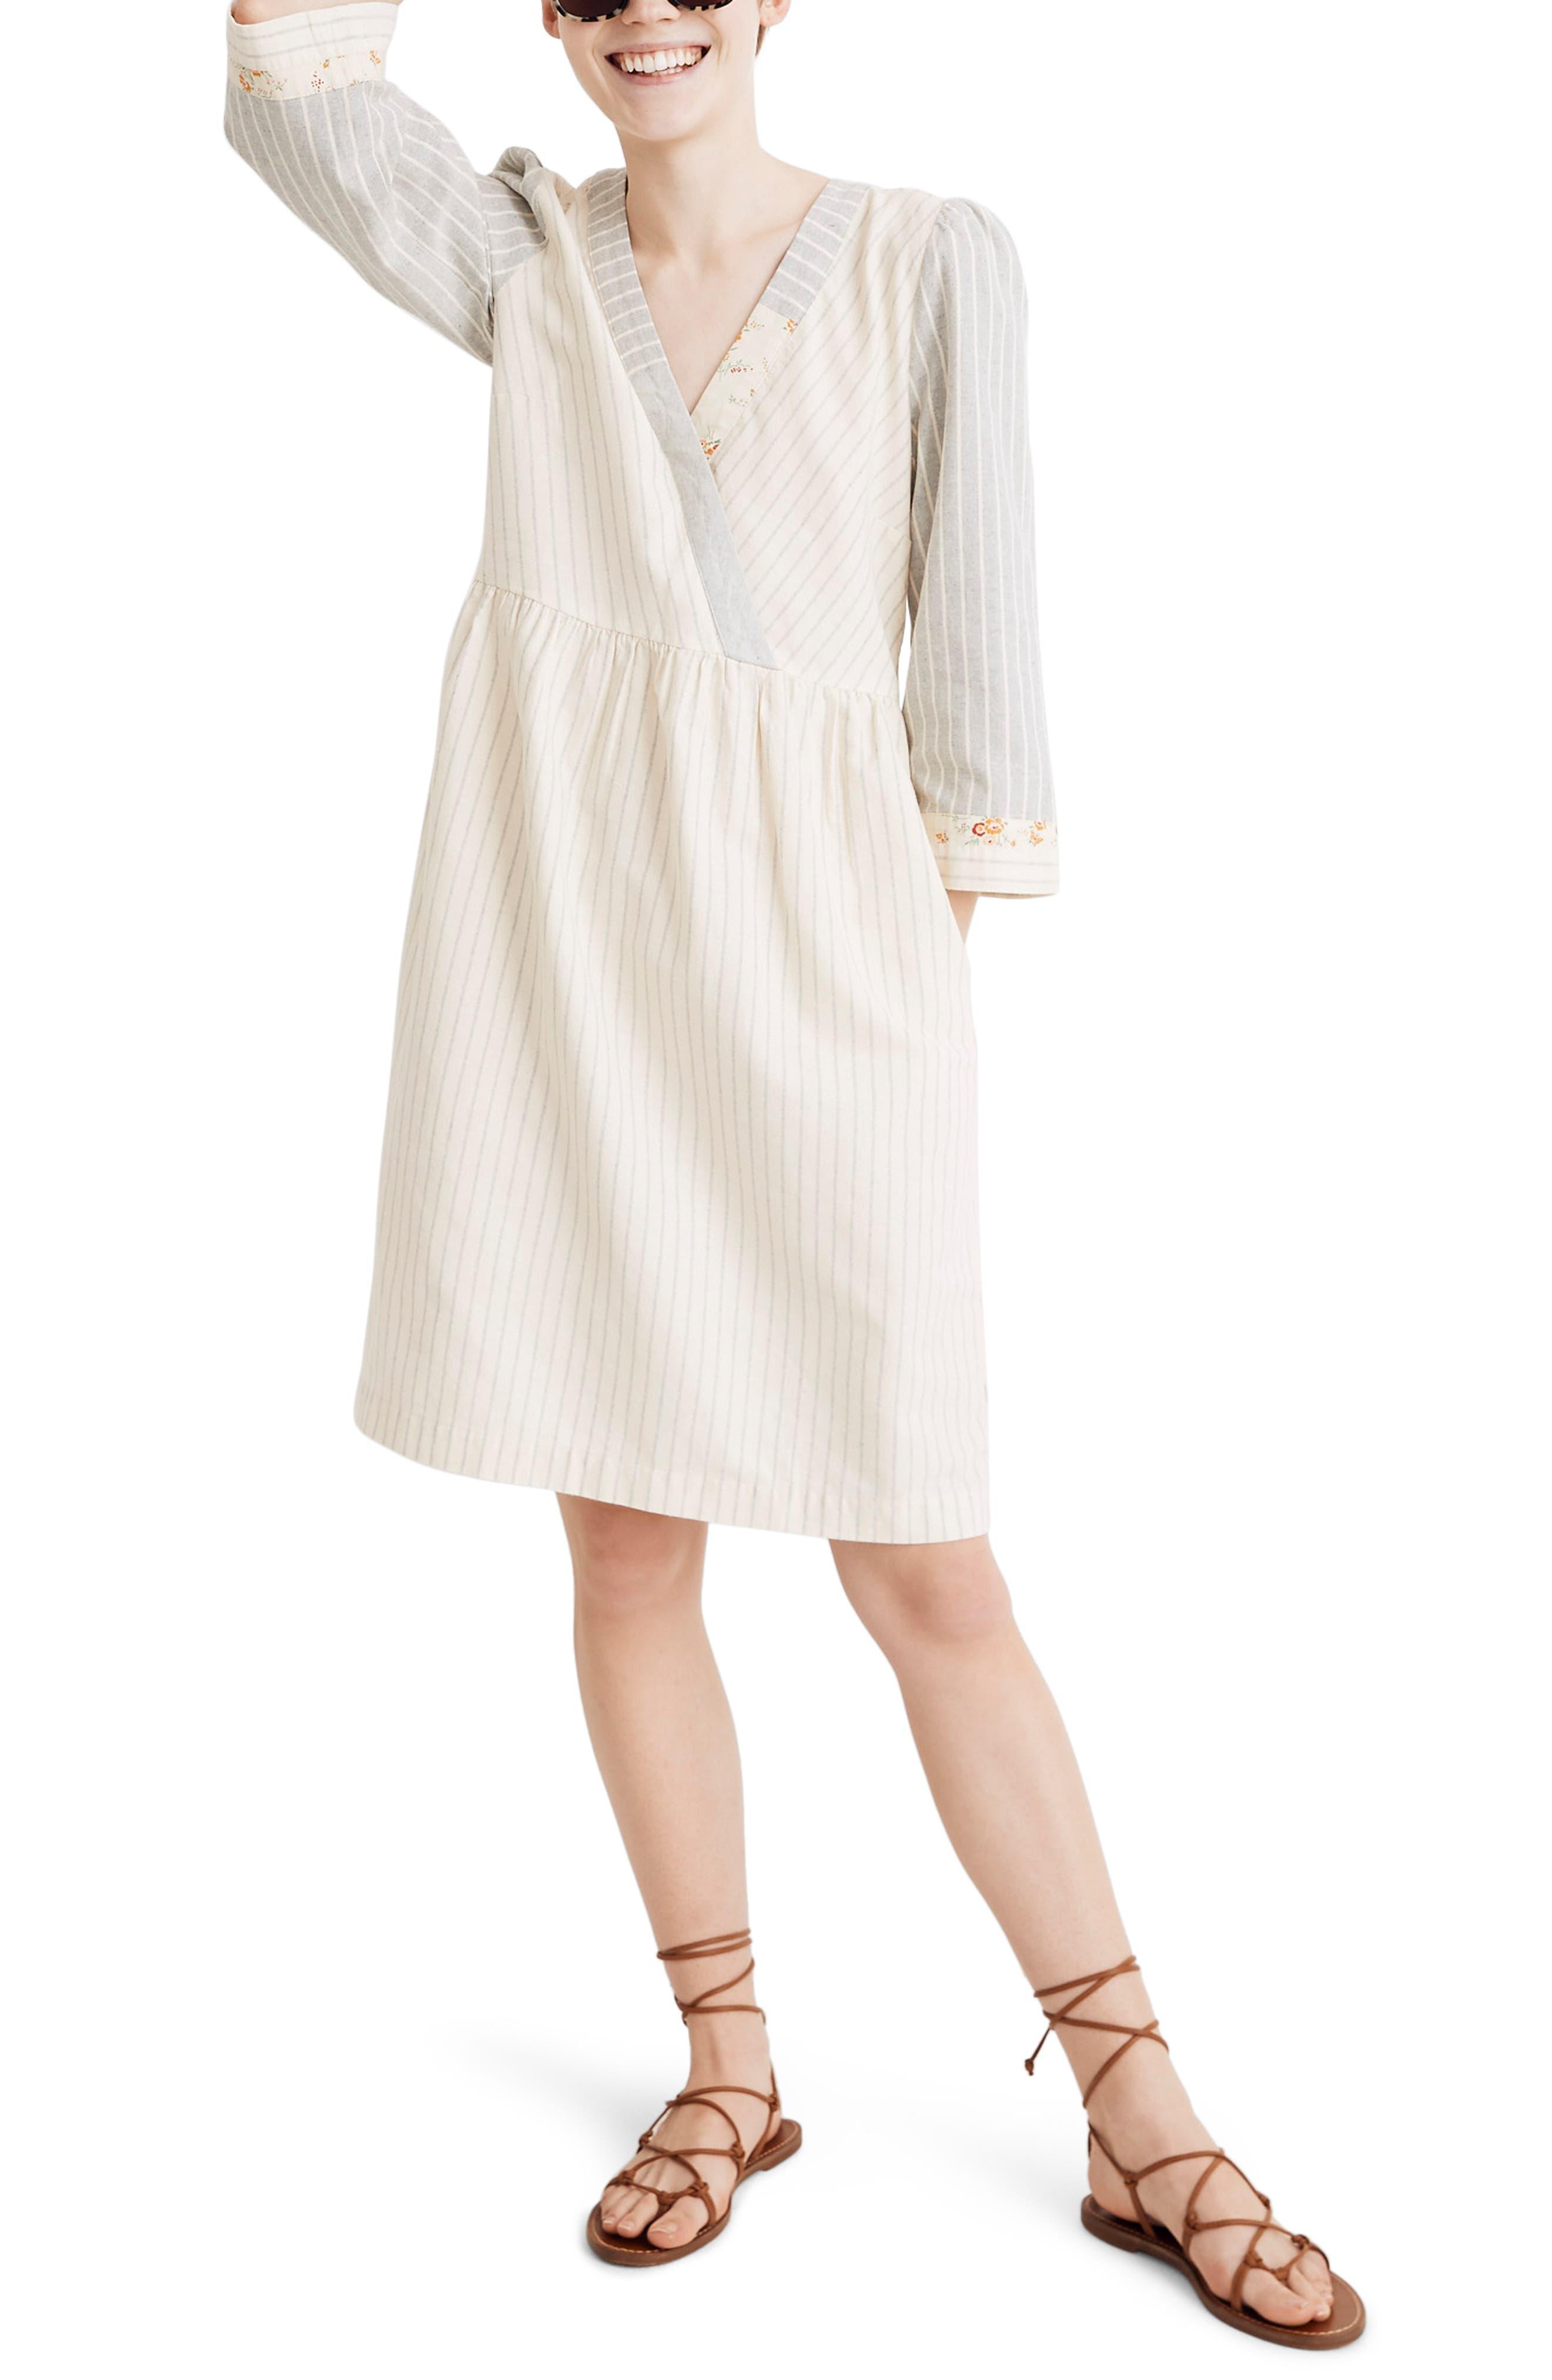 Madewell X The New Denim Project Stripe Mix Long Sleeve Dress, White